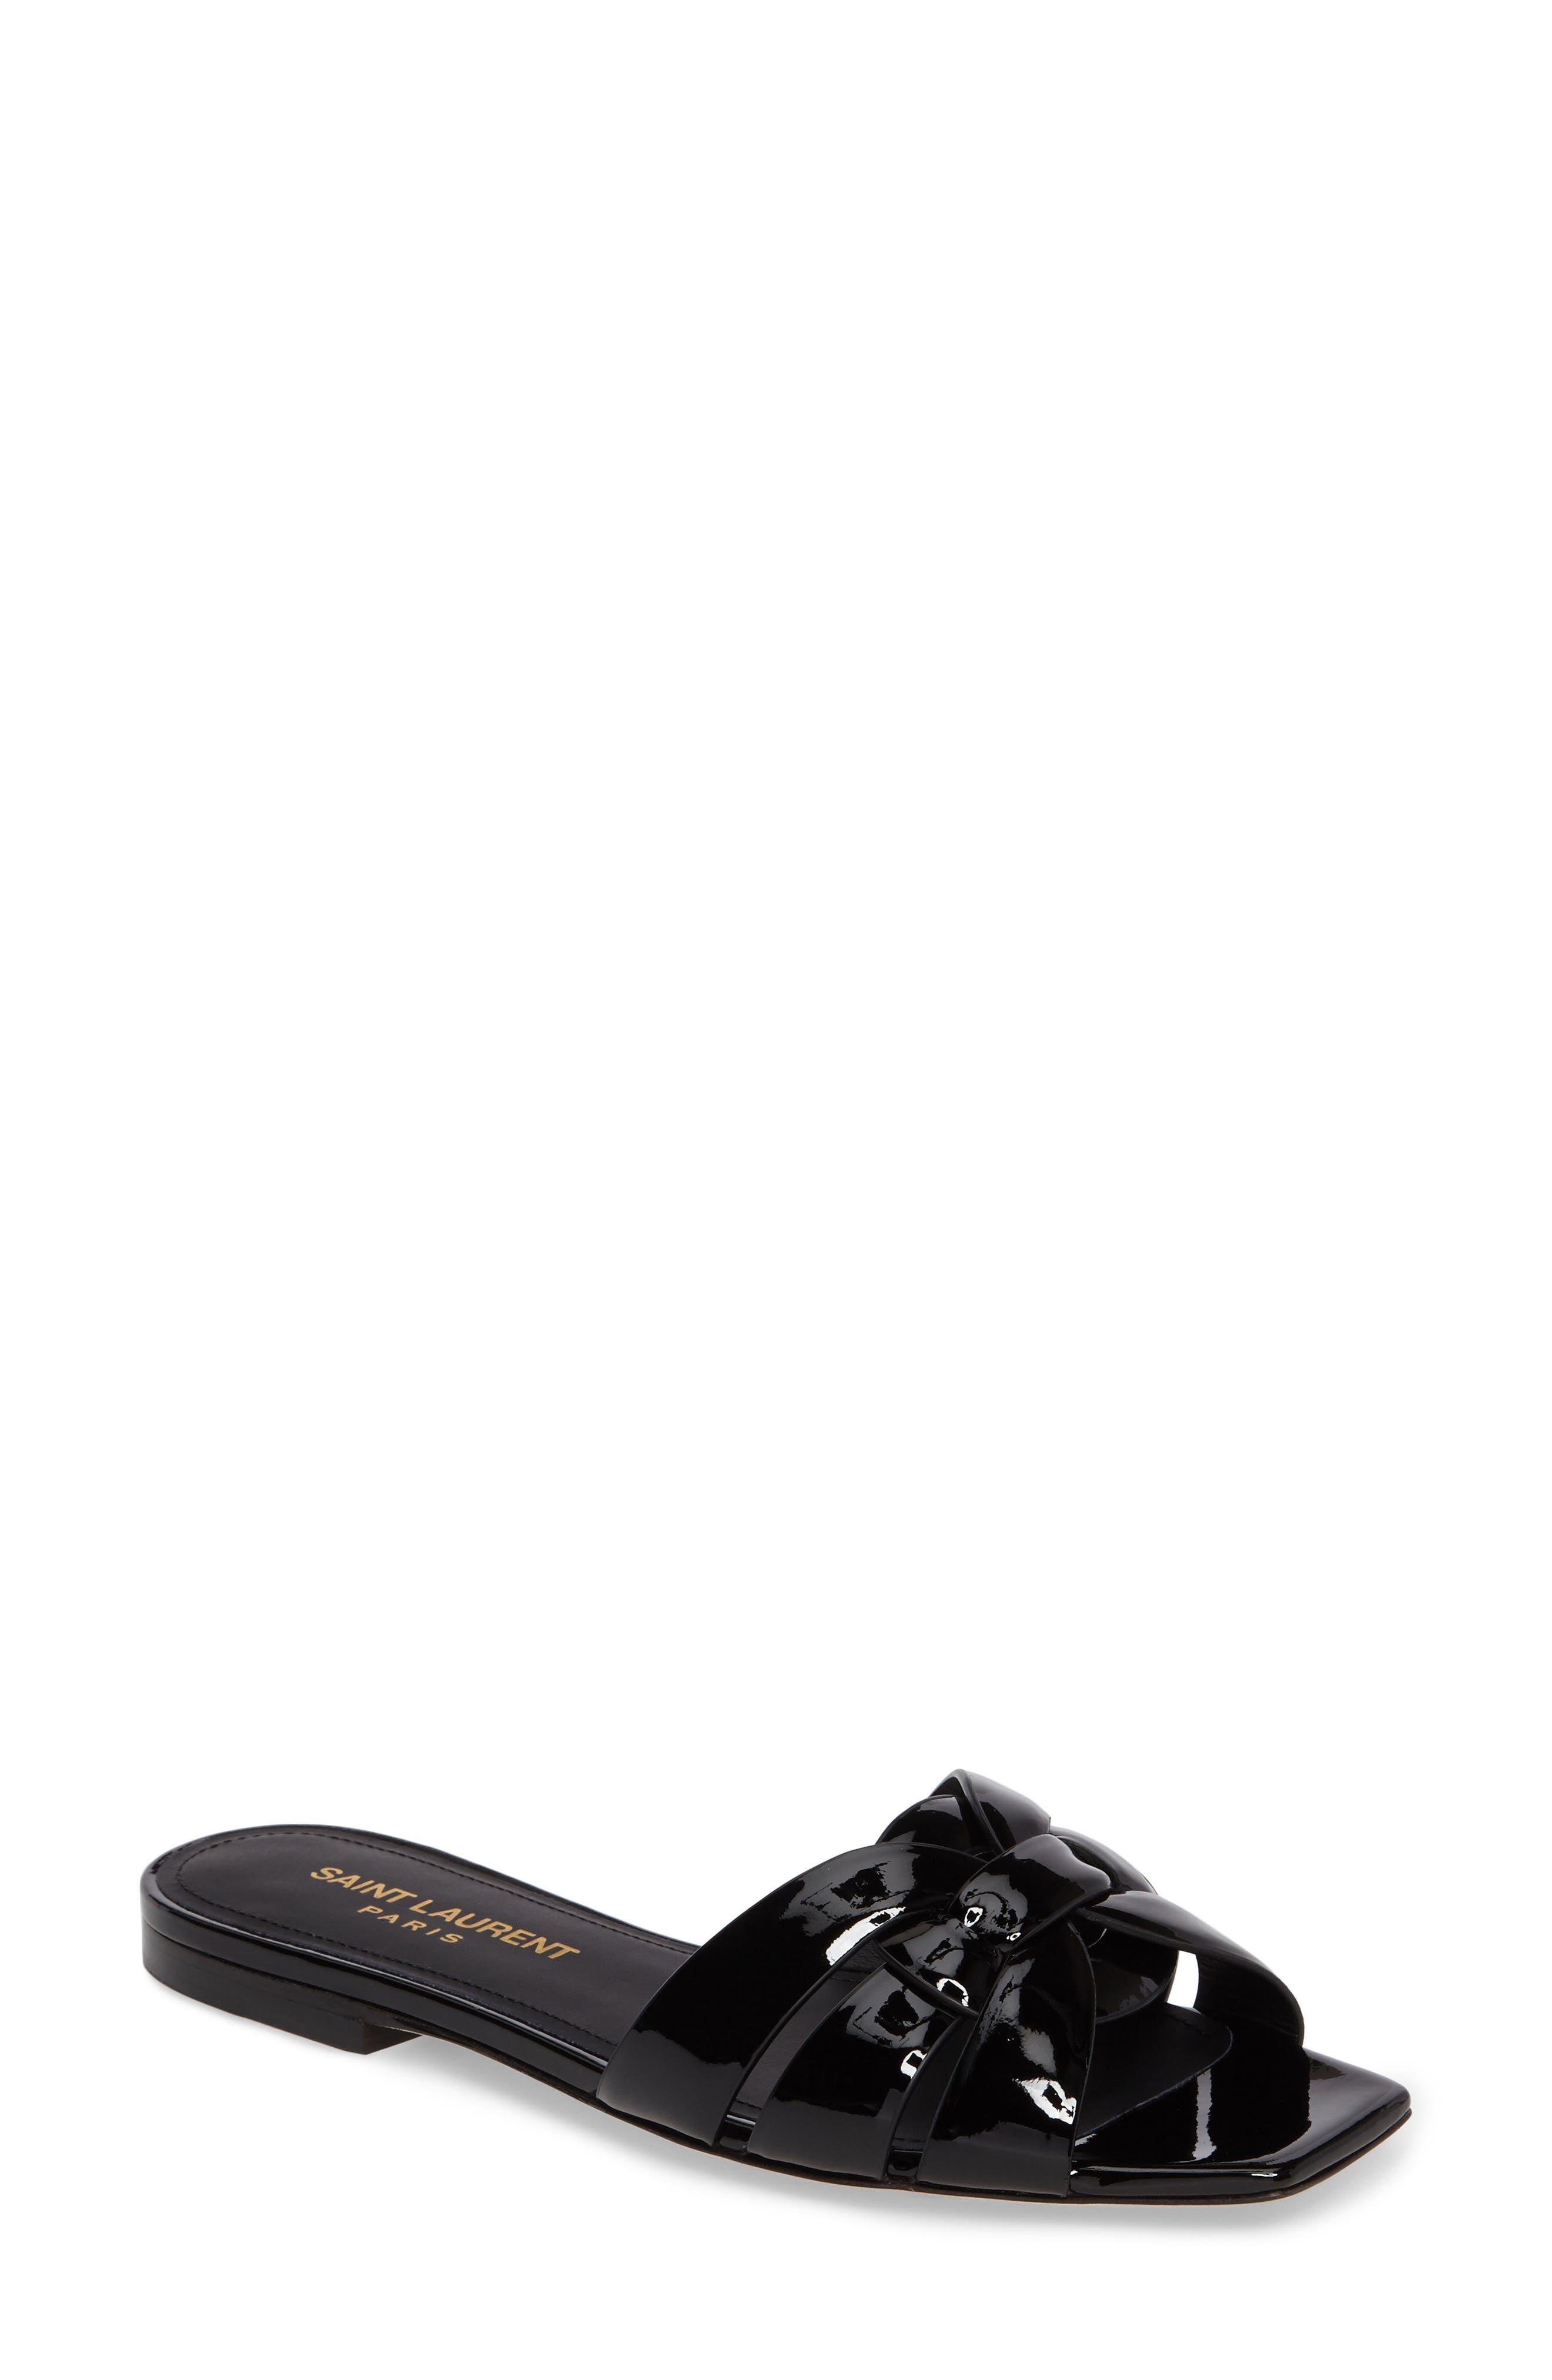 Tribute Slide Sandal, Main, color, BLACK PATENT